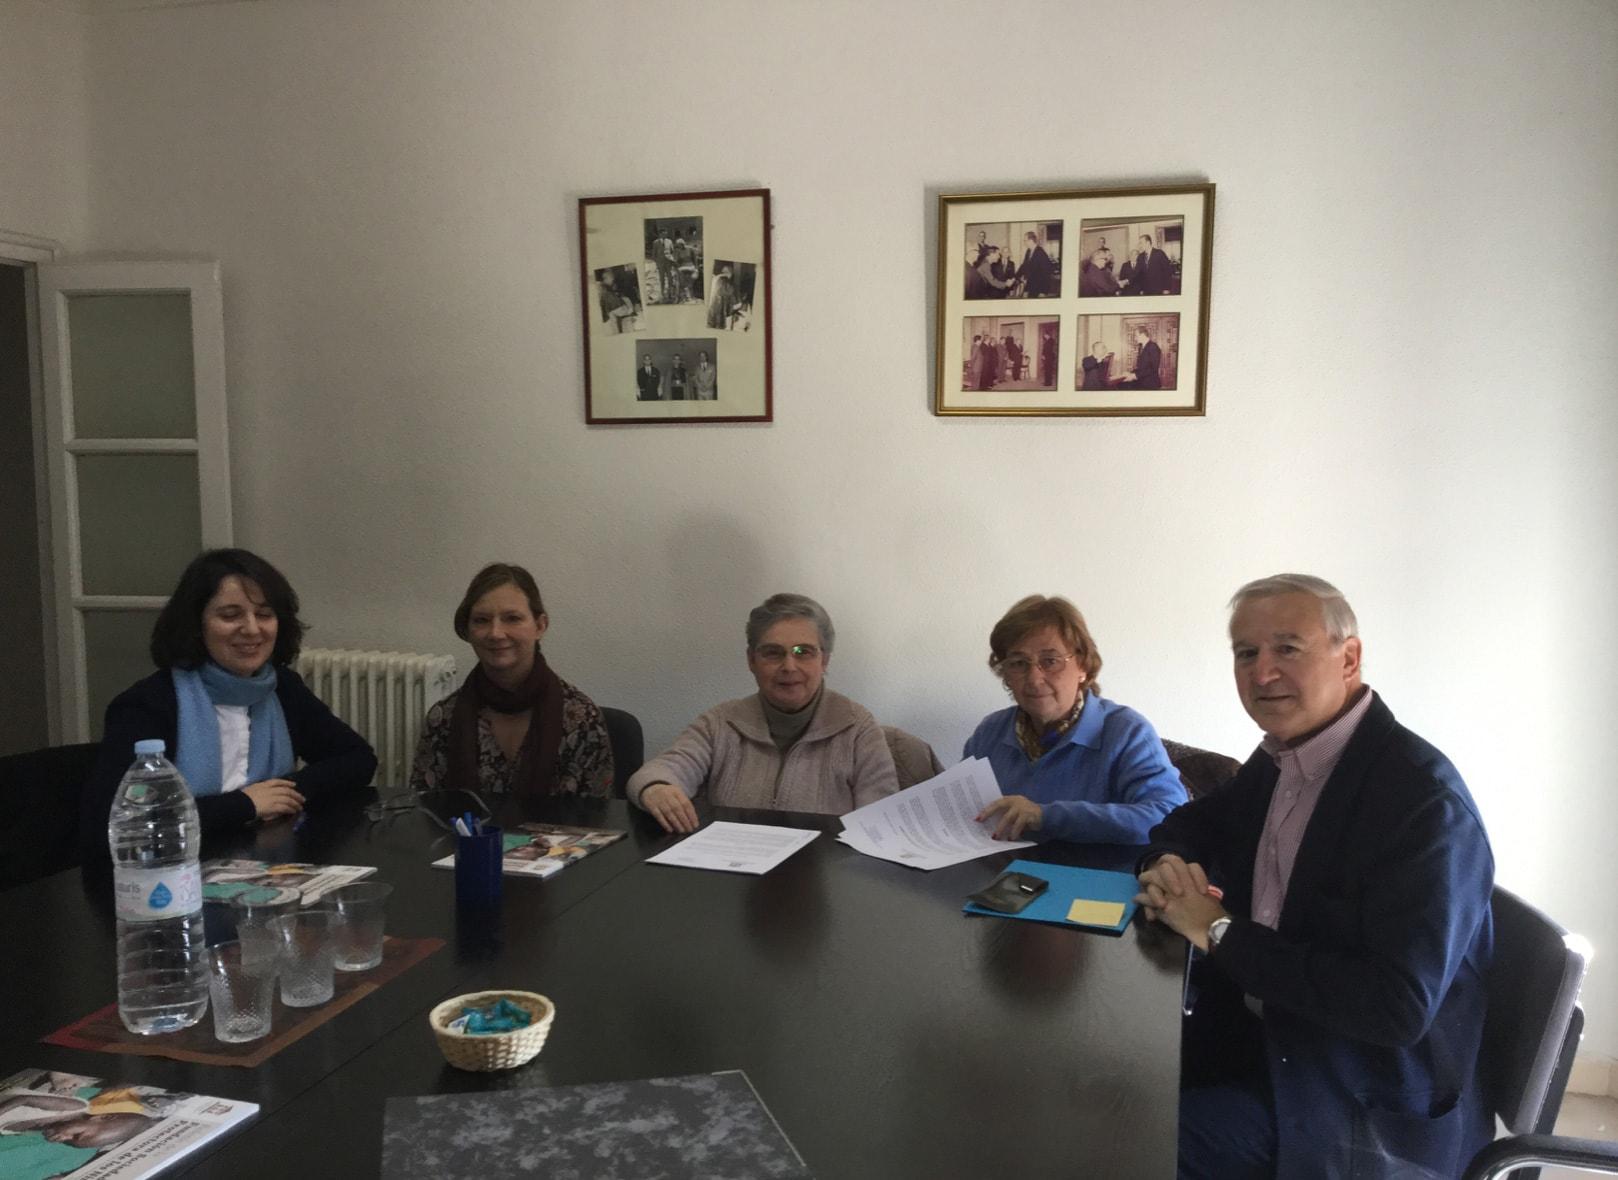 Las becas comedor llegan a santander protectora ni os for Becas comedor 2017 madrid